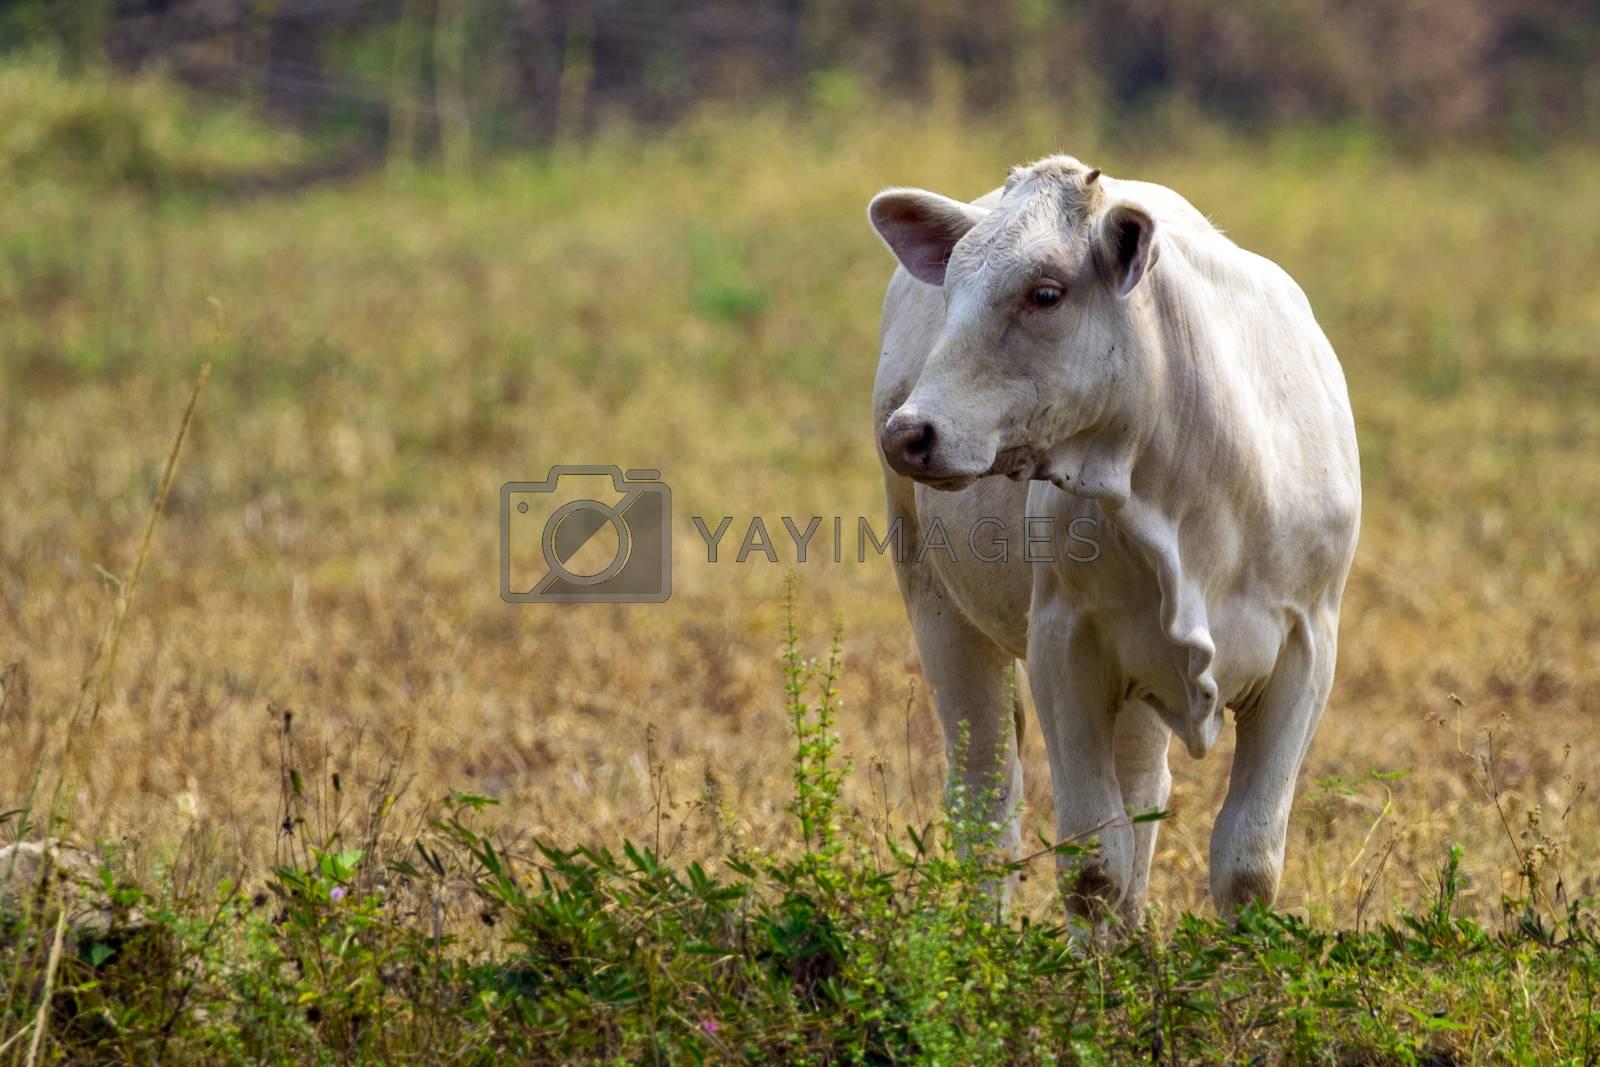 Image of white cow on nature background. Animal farm